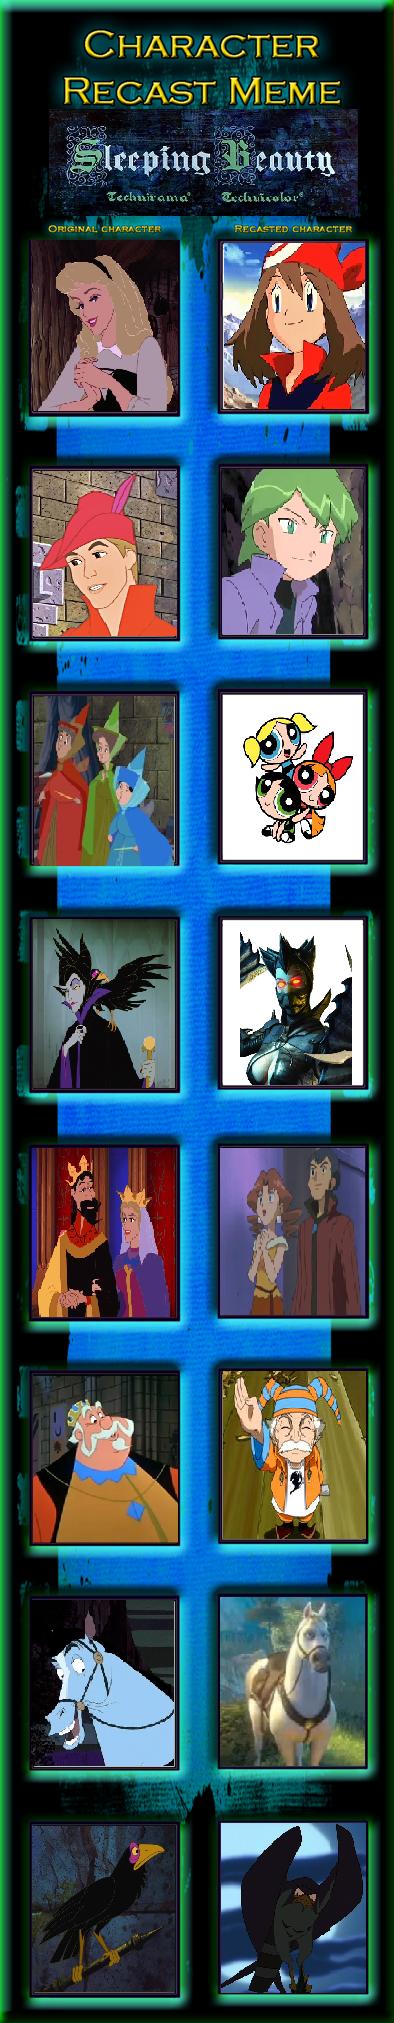 Character Recast Meme: Sleeping May by PrincessGemSquirrel